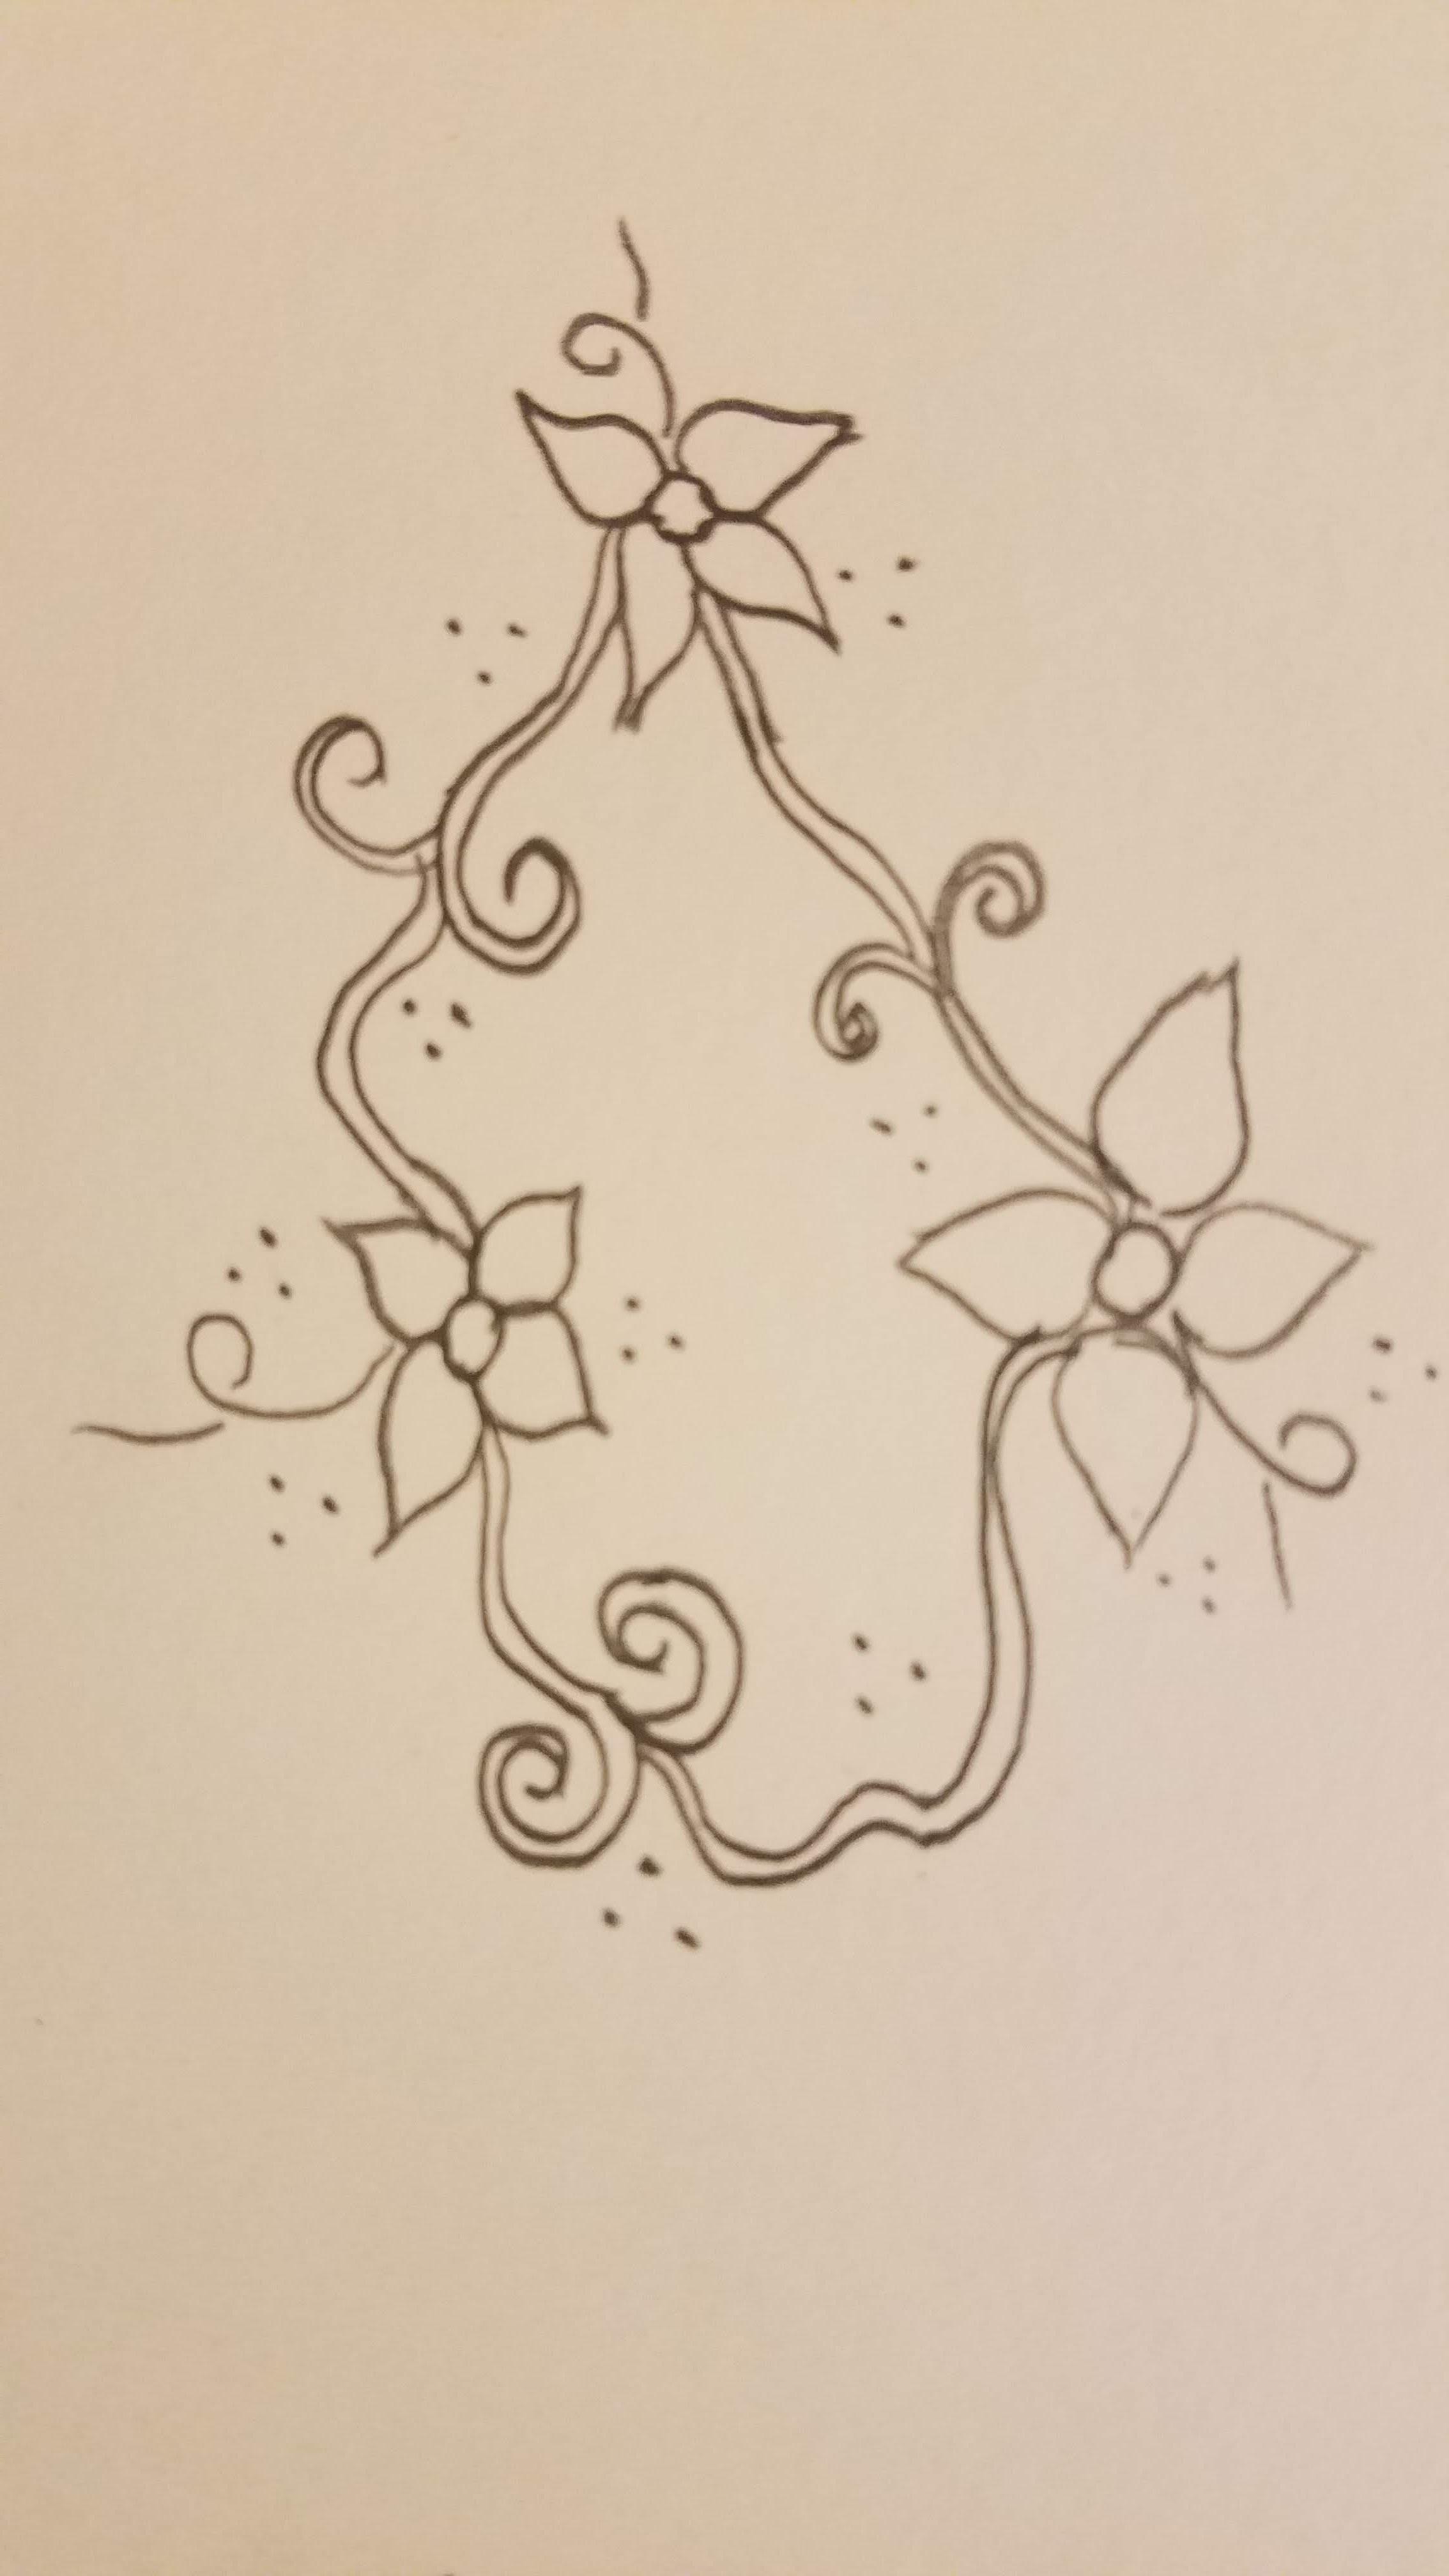 flower-wreath-doodle